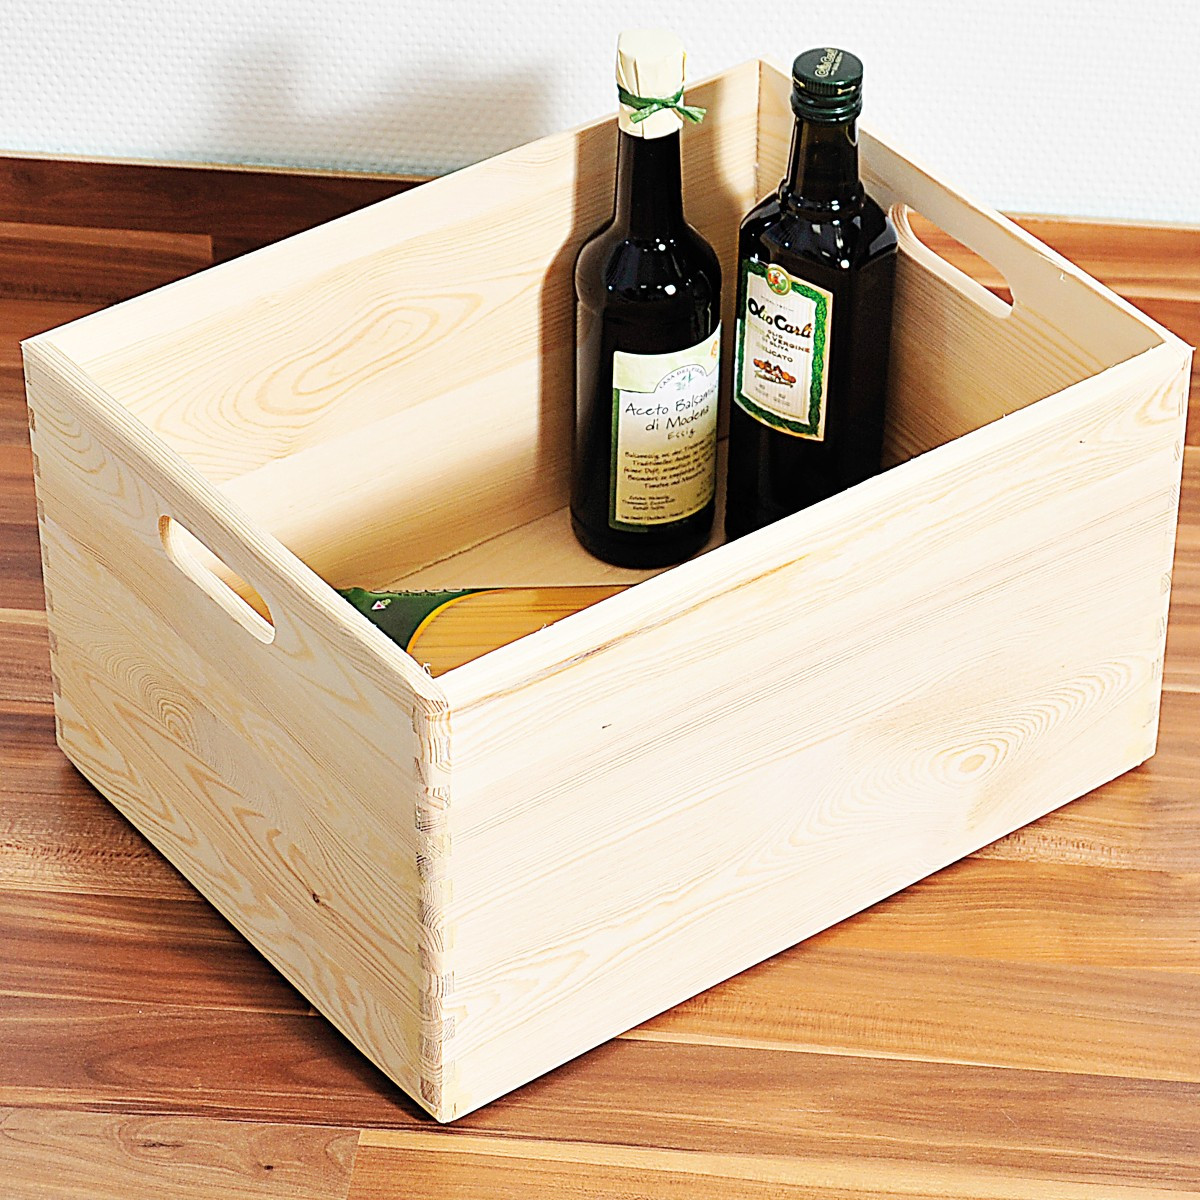 caisse en bois rangement cuisine. Black Bedroom Furniture Sets. Home Design Ideas